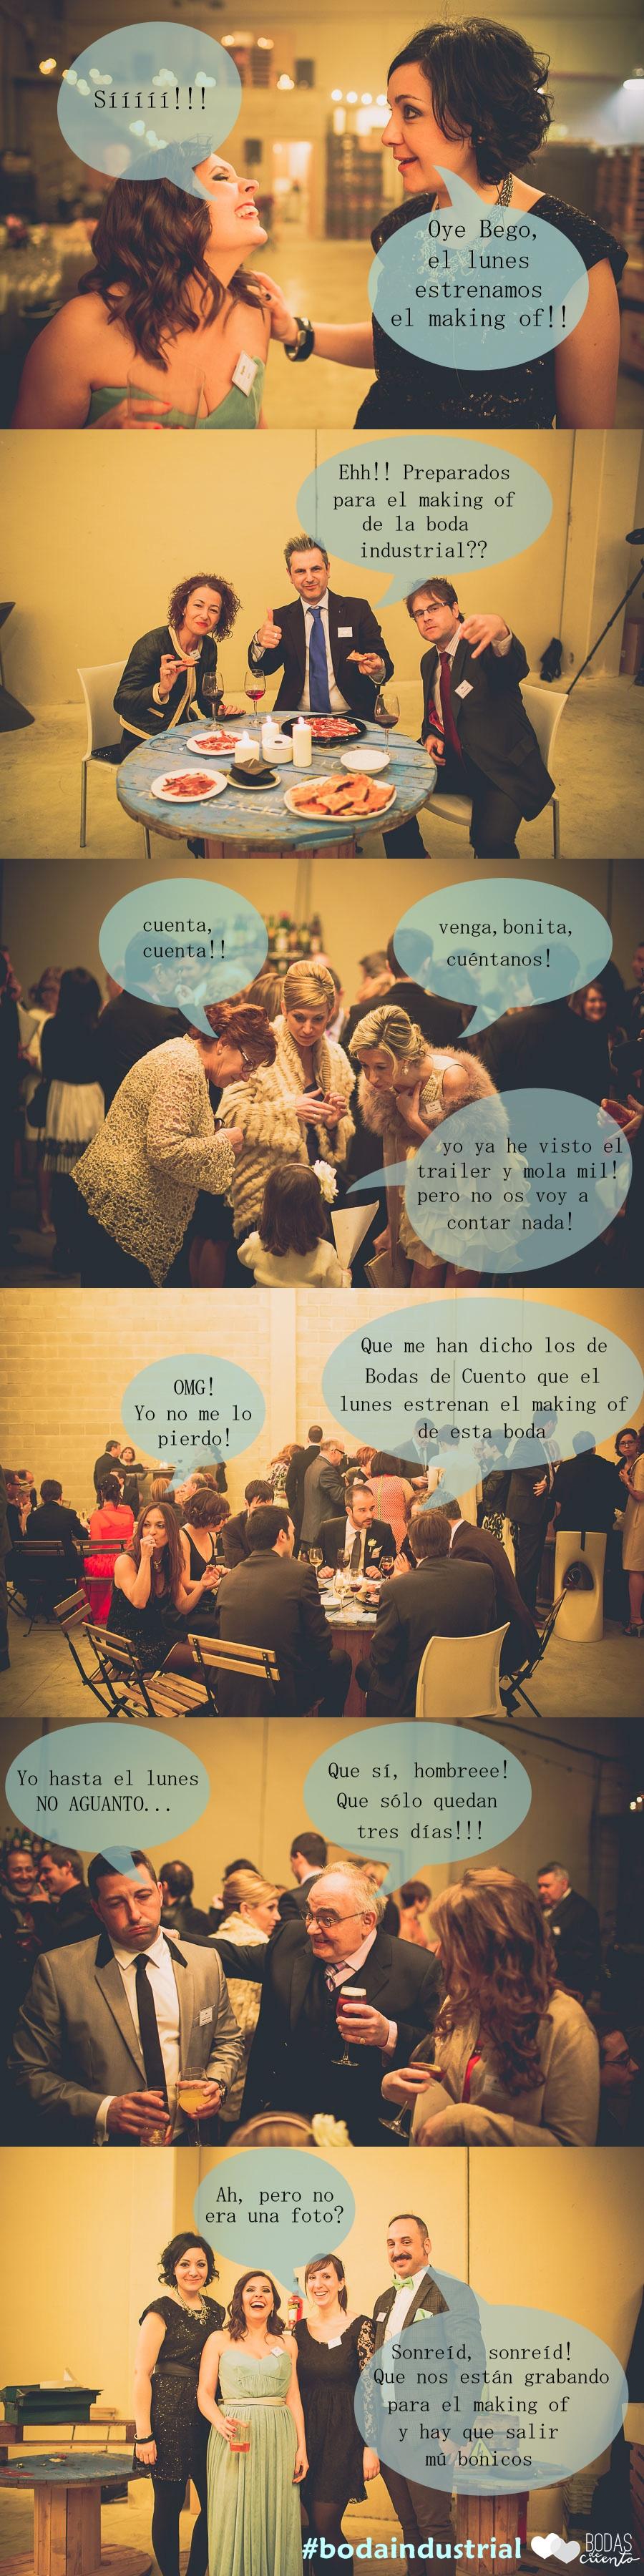 Boda-insdustrial-bodas-de-cuento-wedding-planners